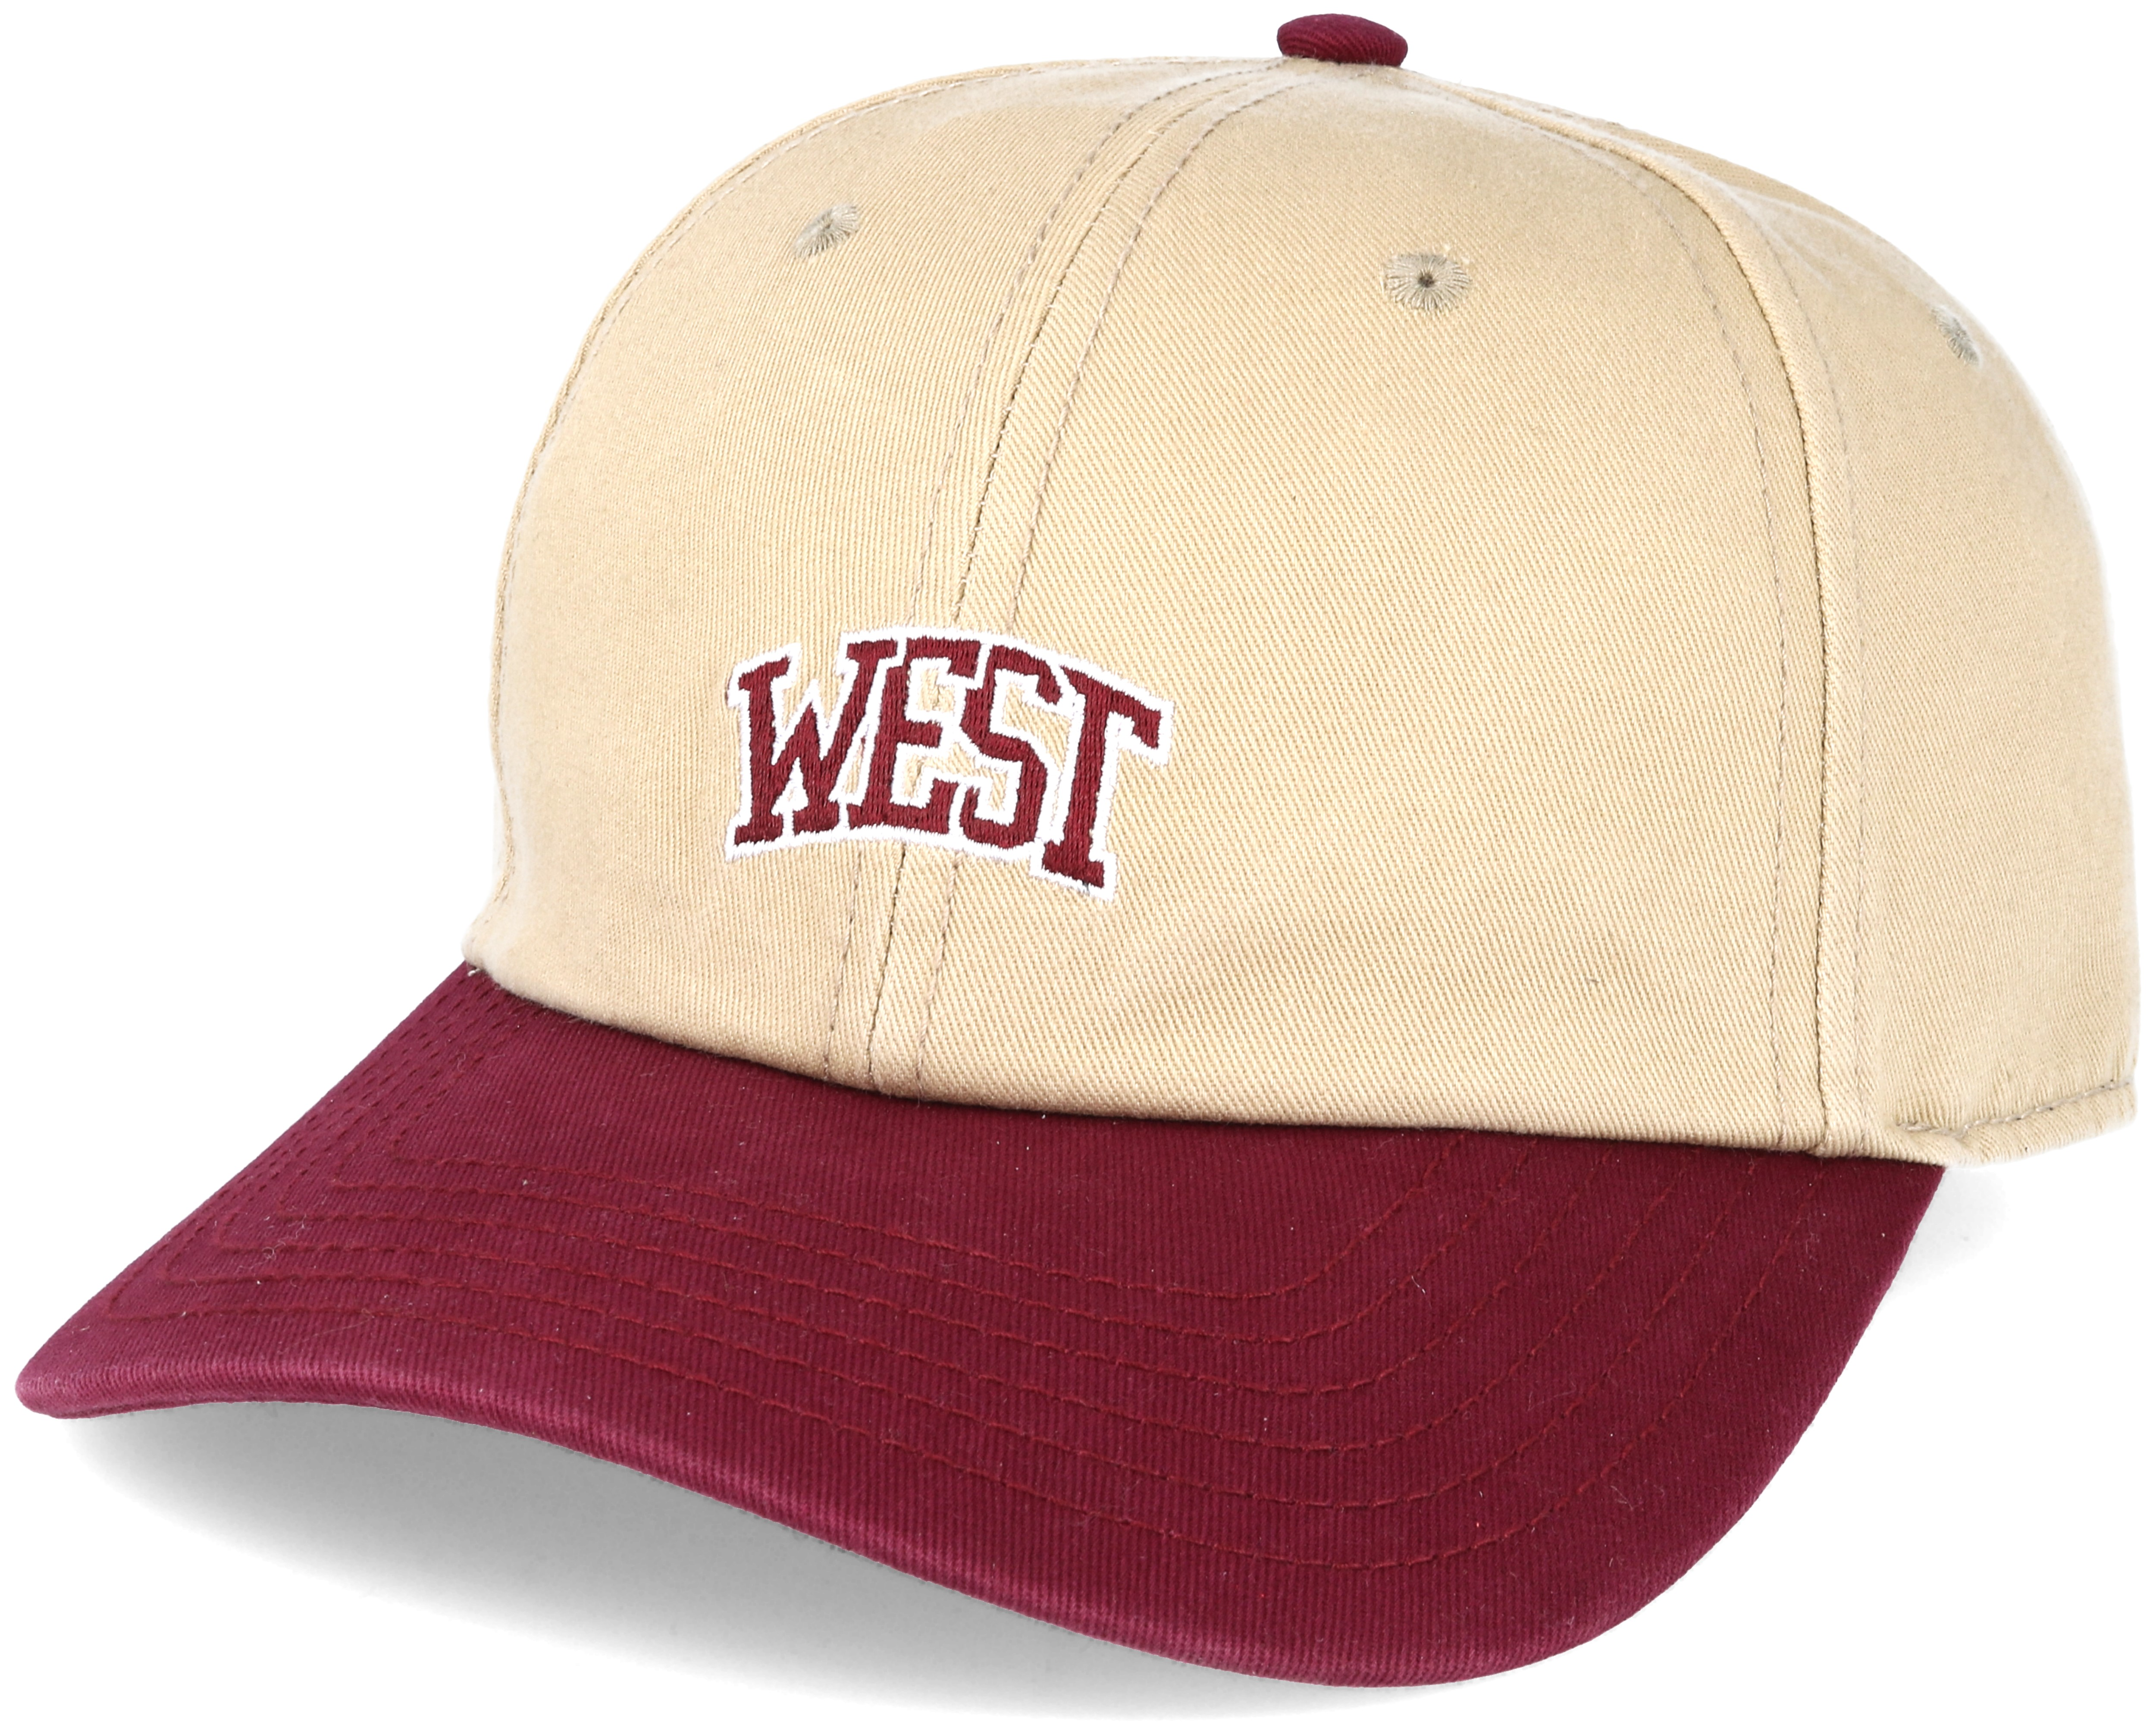 West University Curved Sand Snapback Cayler Amp Sons Caps